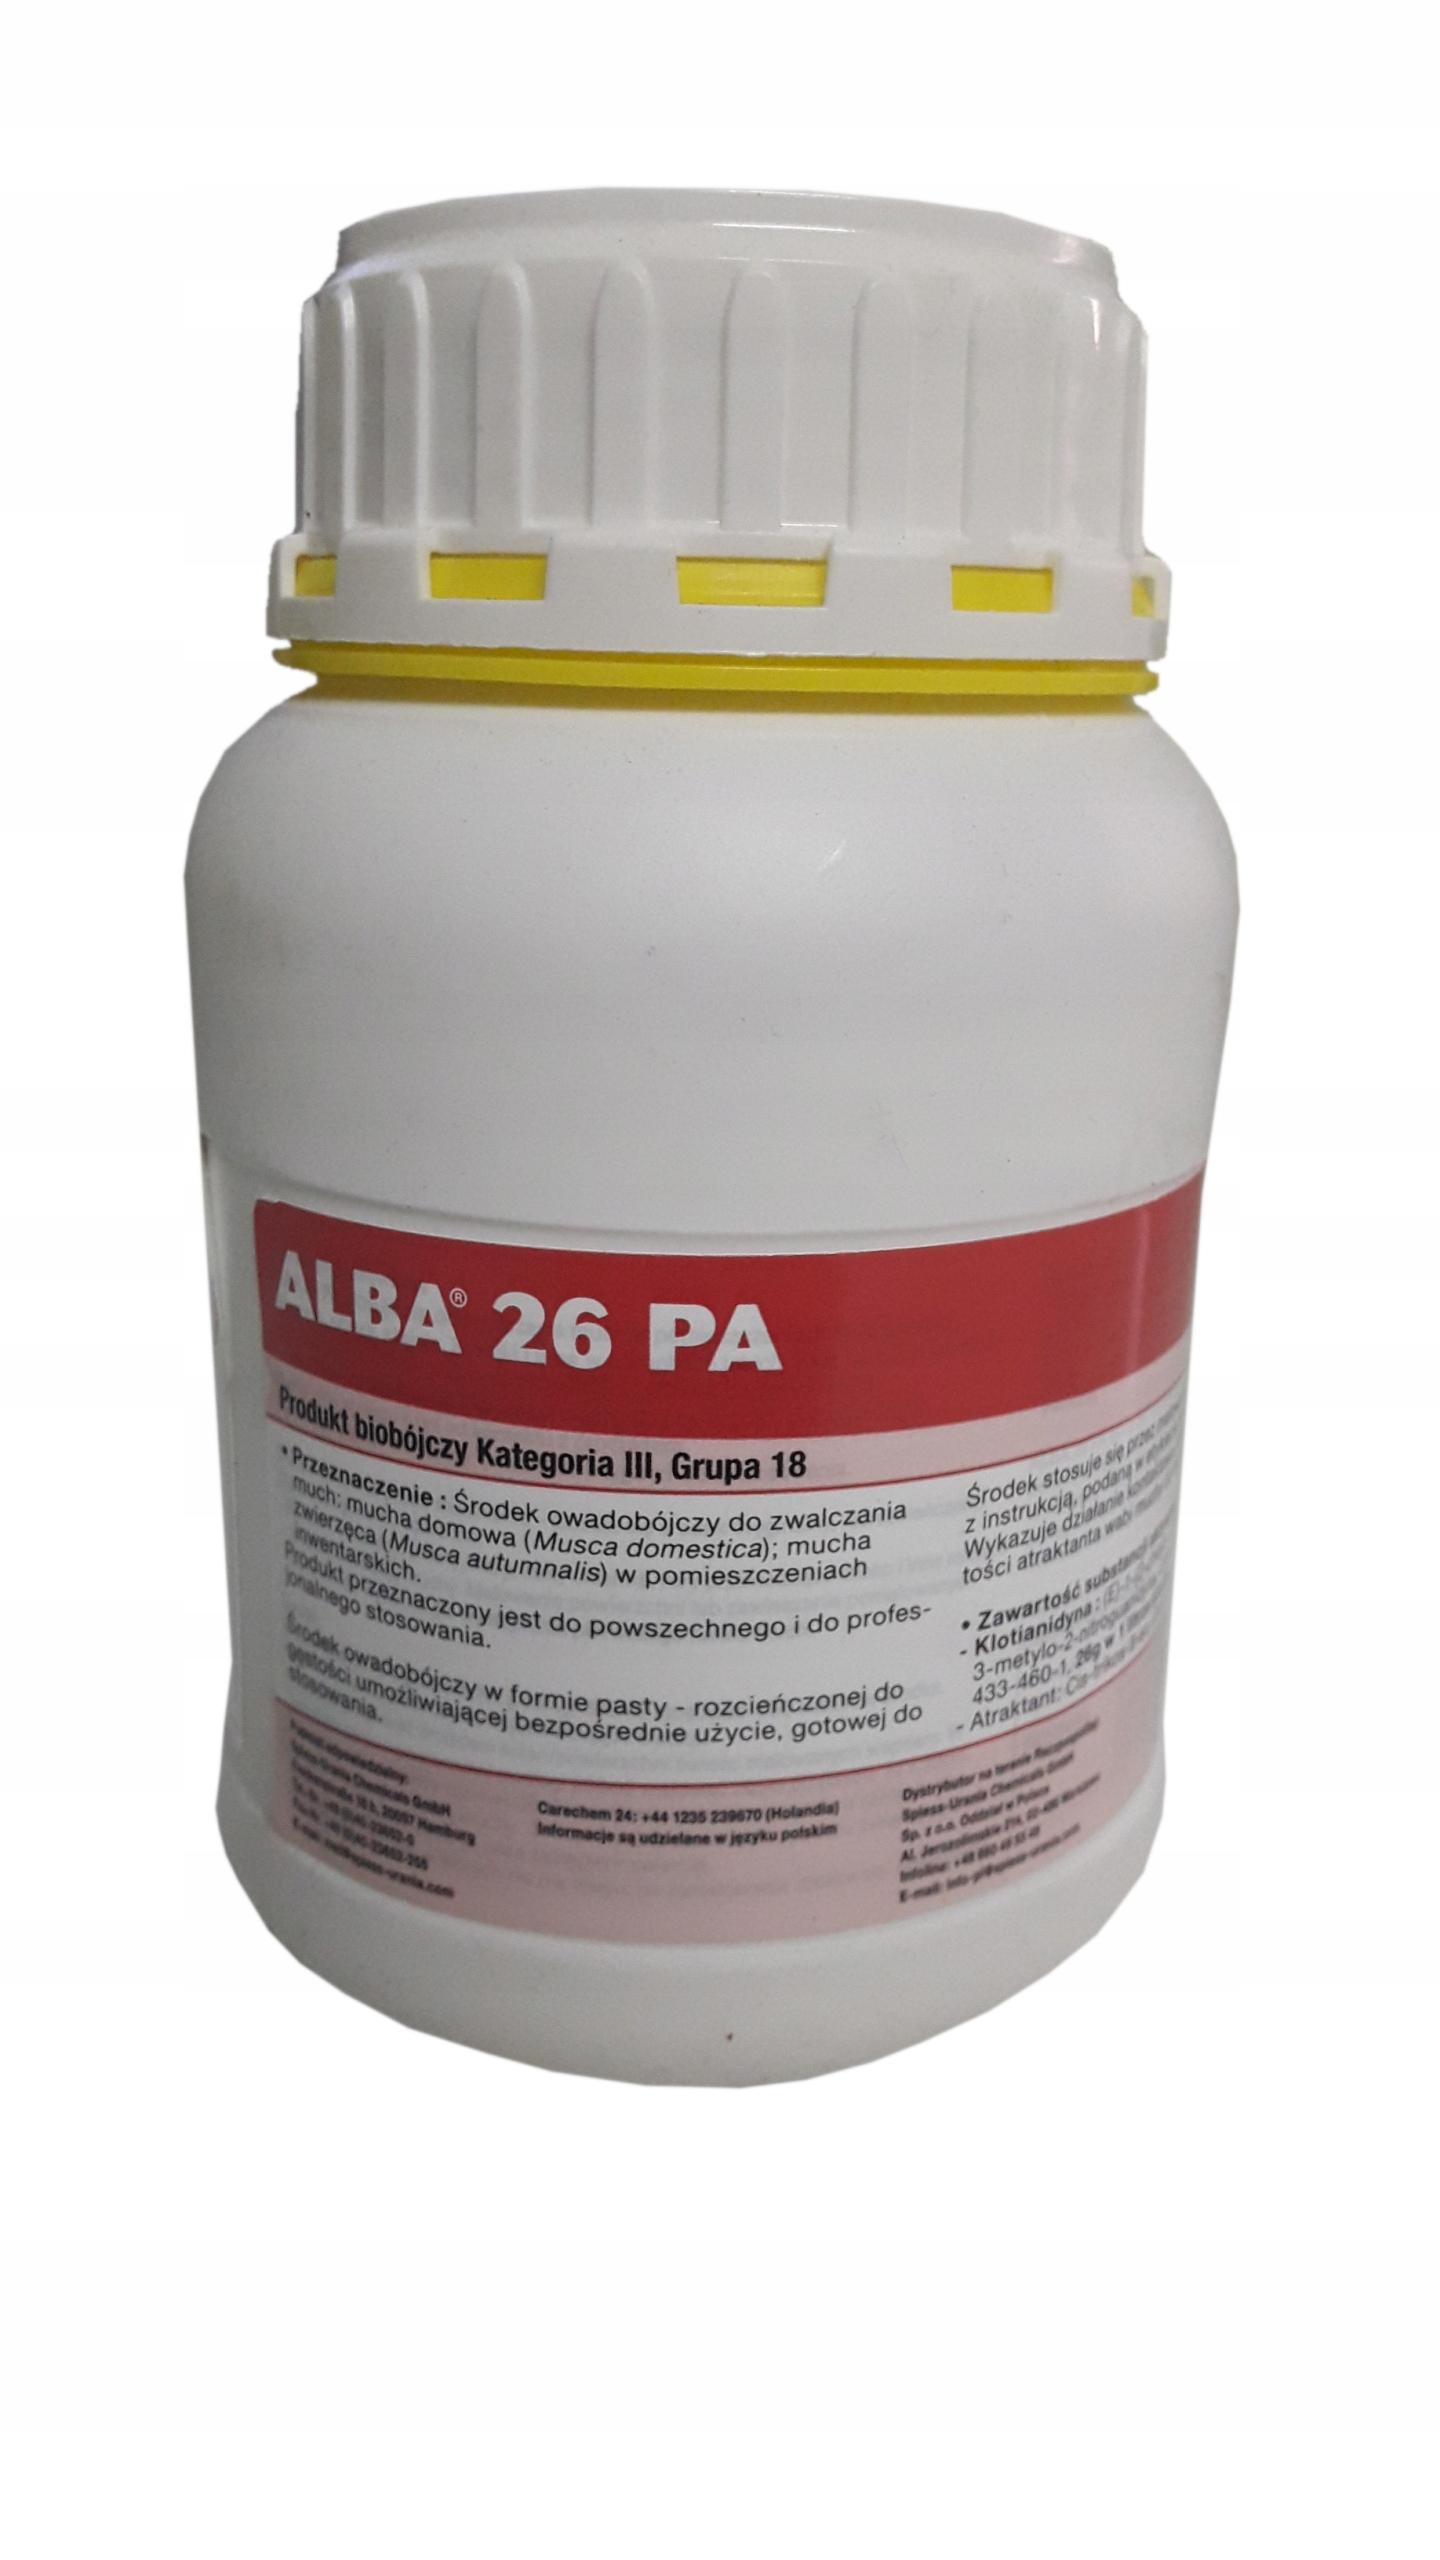 ALBA 26 PA инсектицид для борьбы с мухами